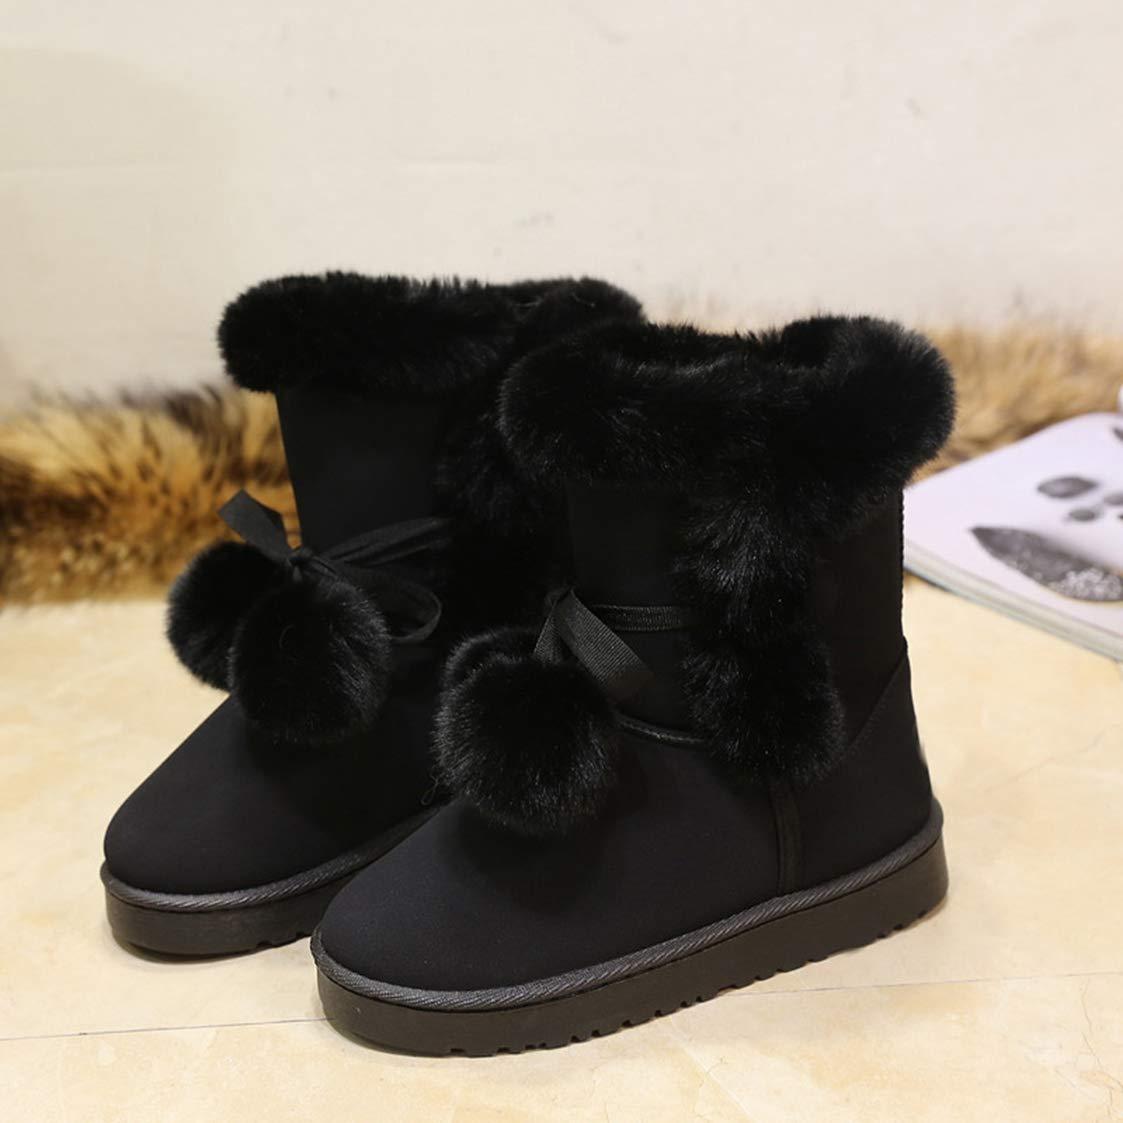 UKURO Female Australia Style Shoes Cutewarm Breathable Winter Felt Hair Flat Ankle Snow Boots Cold Weather